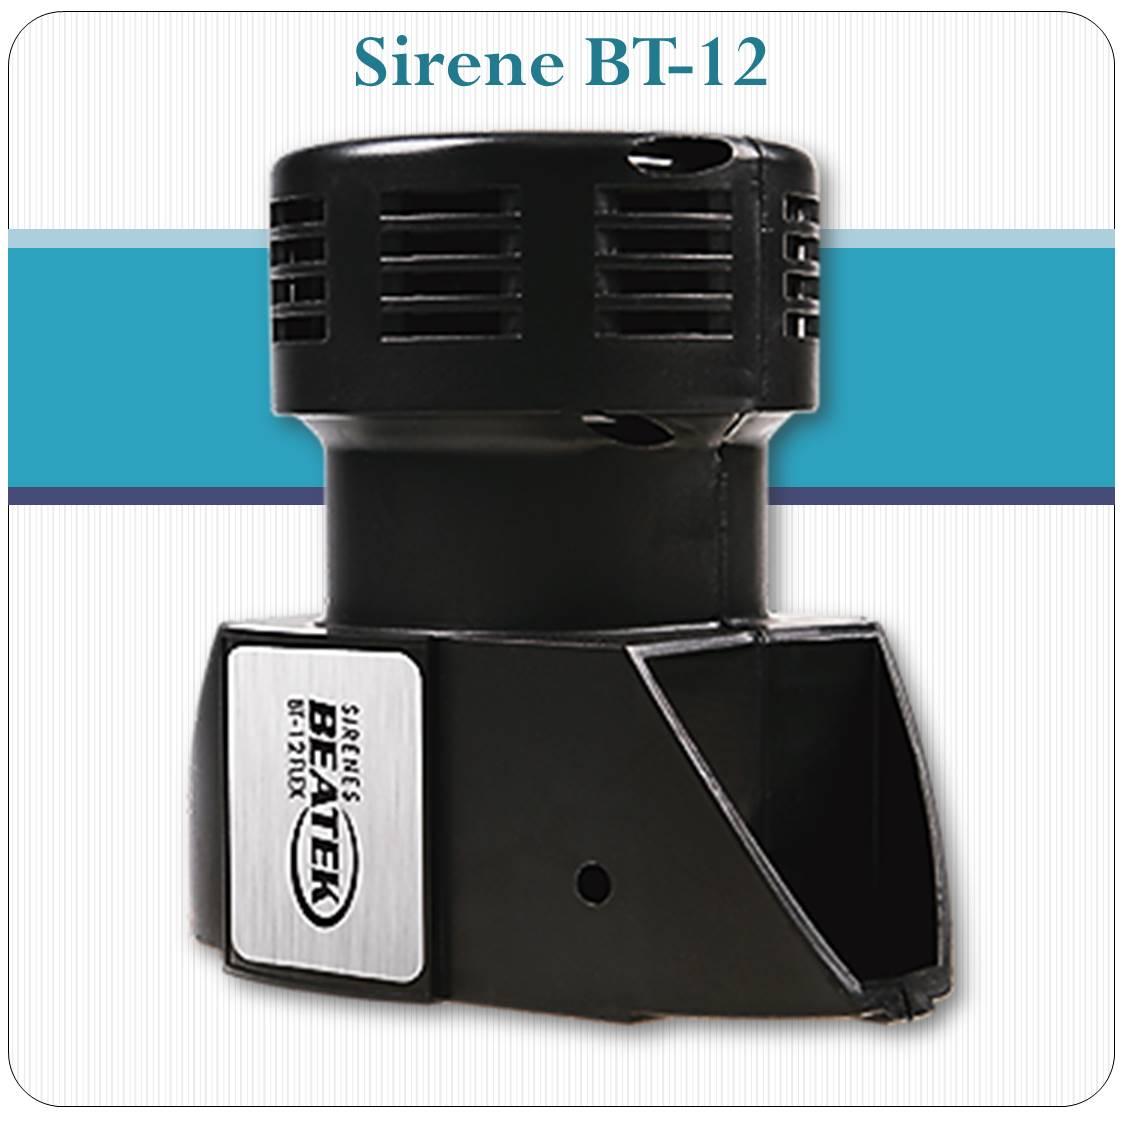 Sirene Eletromecânica BT-12 -  500 à 3000 mt.